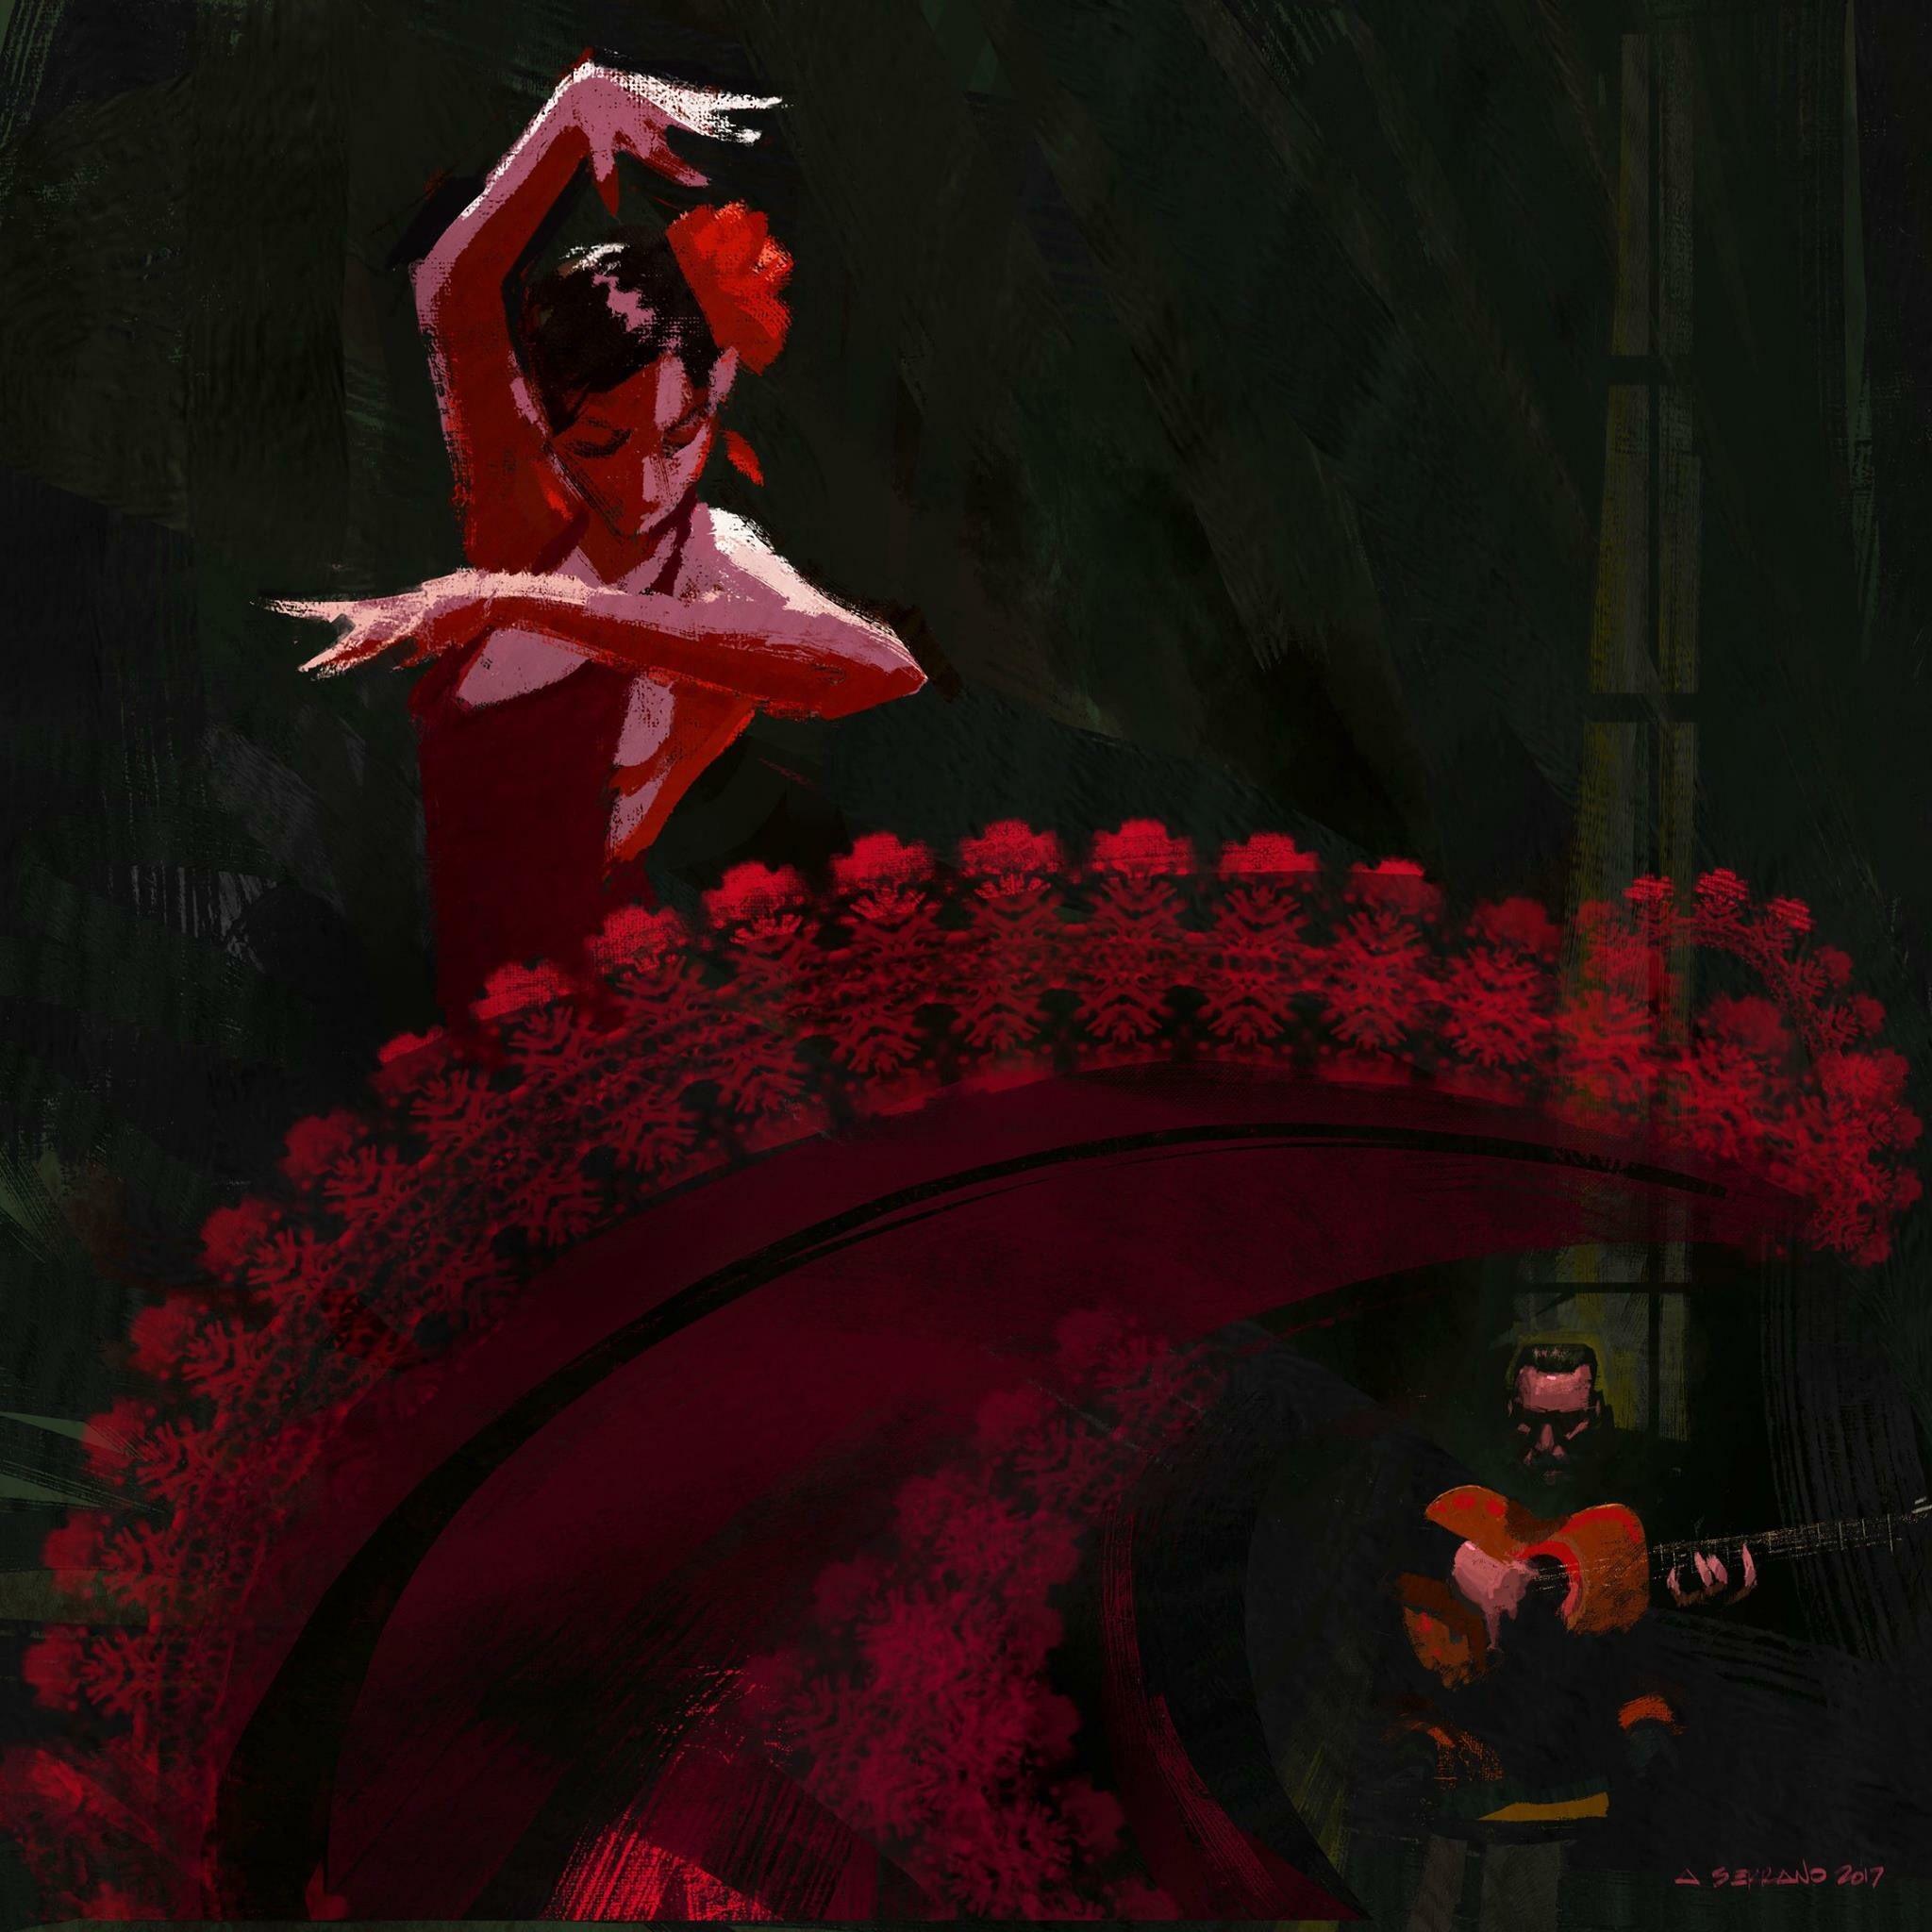 Happy Wednesday! #flamenco #dailychallenge https://t.co/ZvBIdUls9z